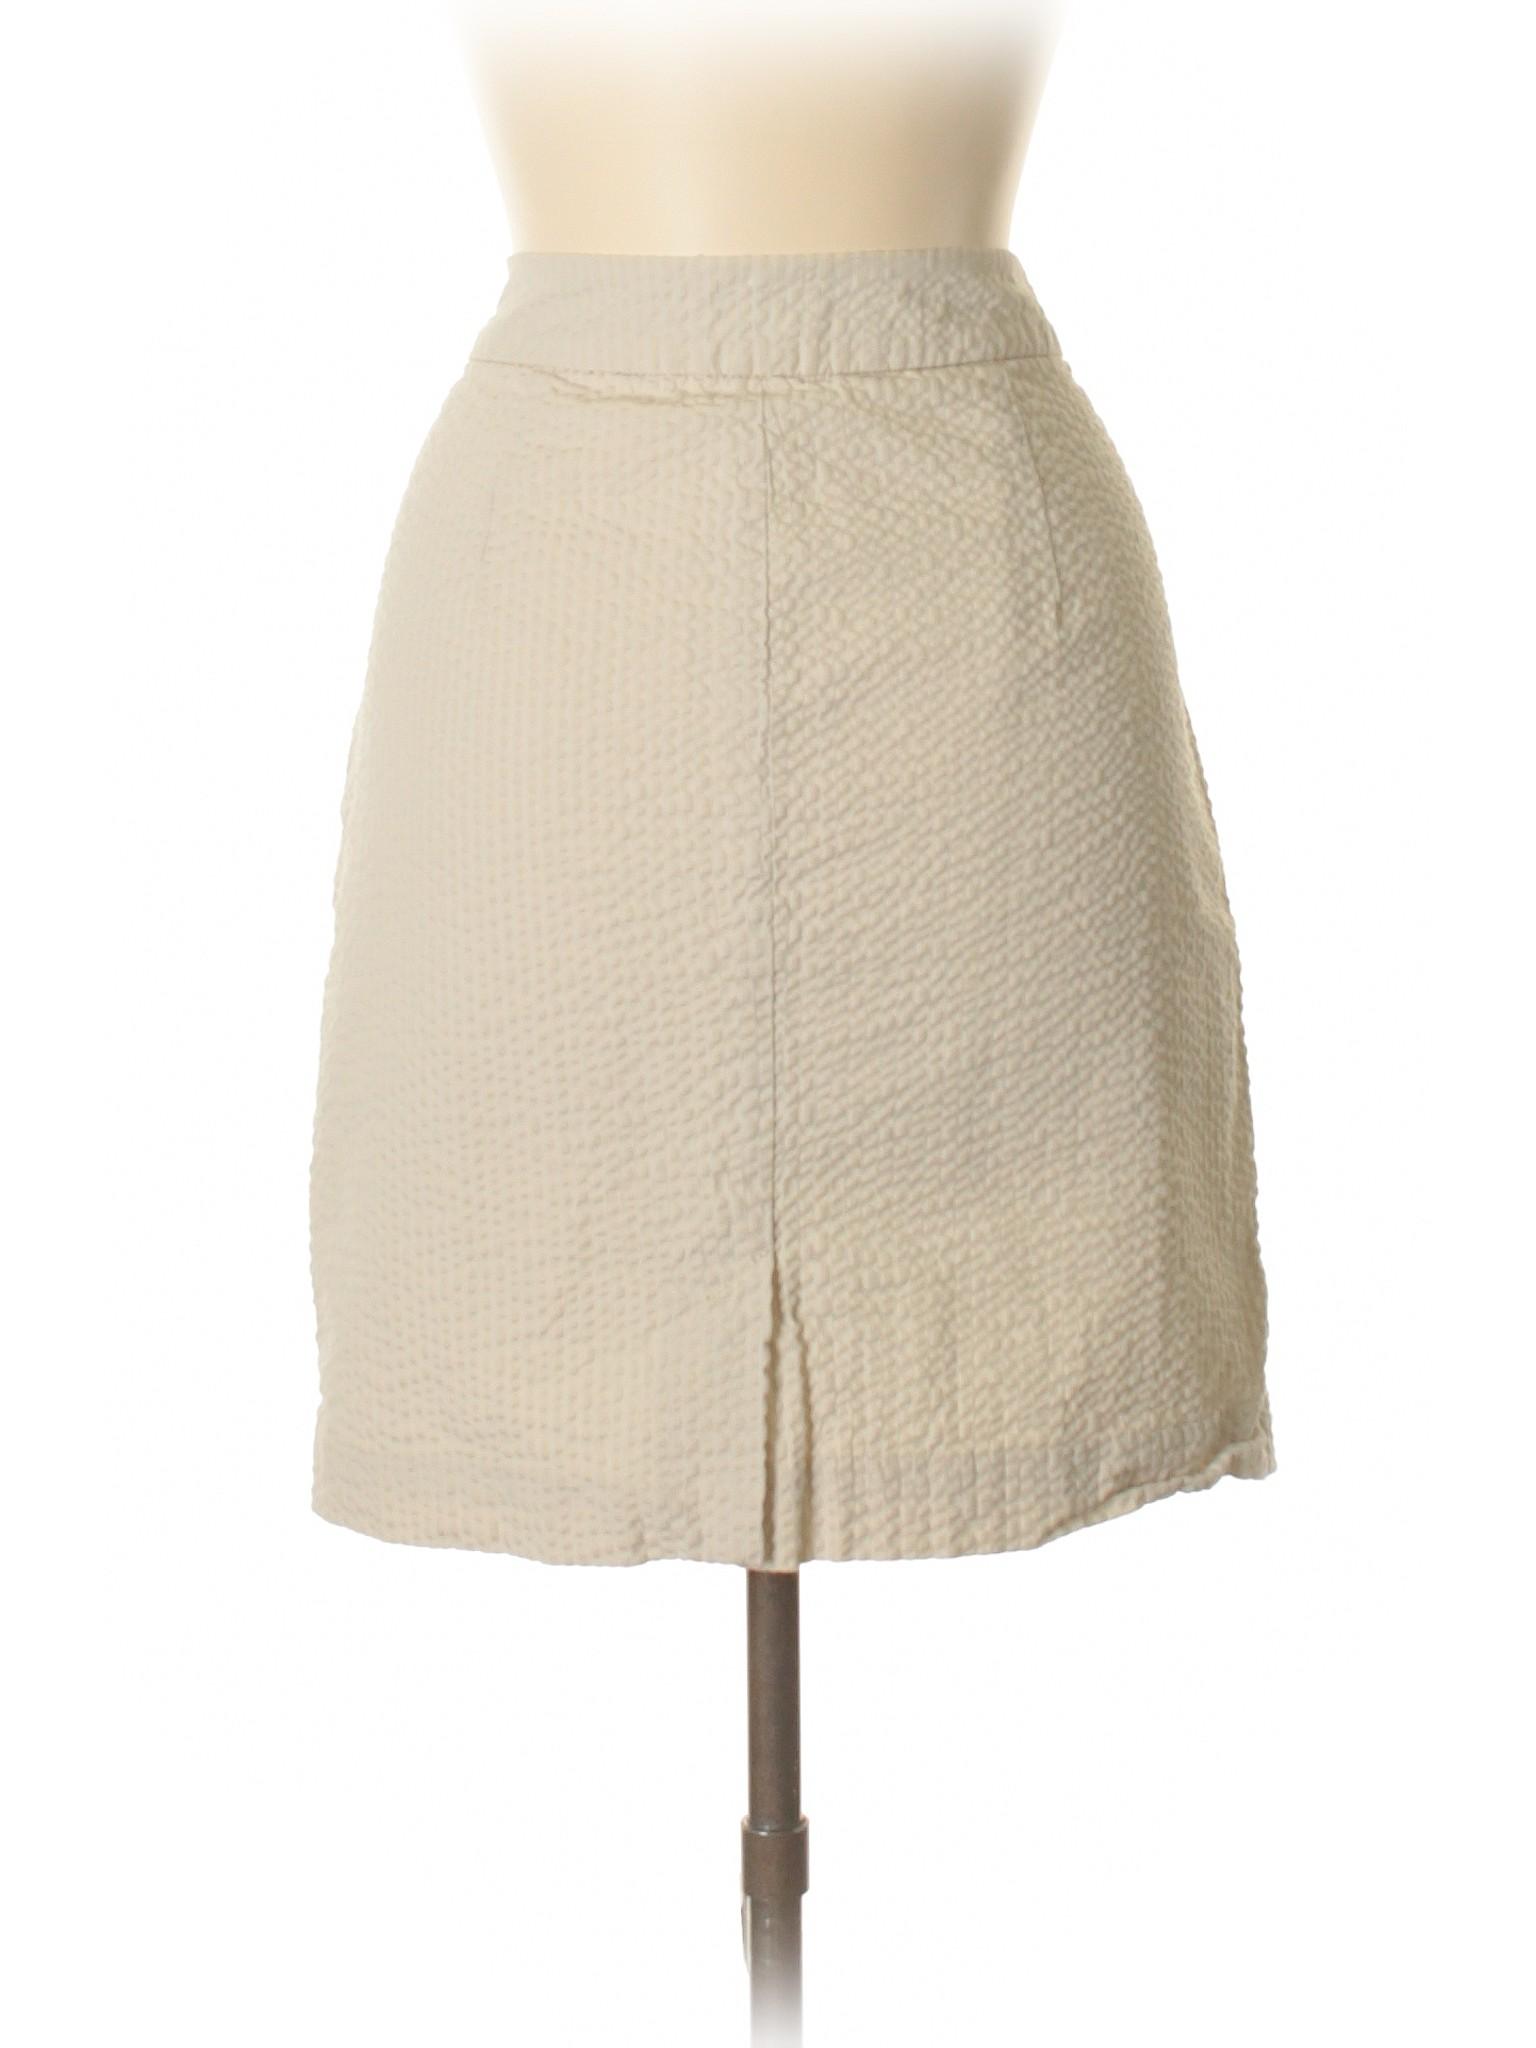 L Casual Factory Store Skirt L Leisure winter Bean 75YUq